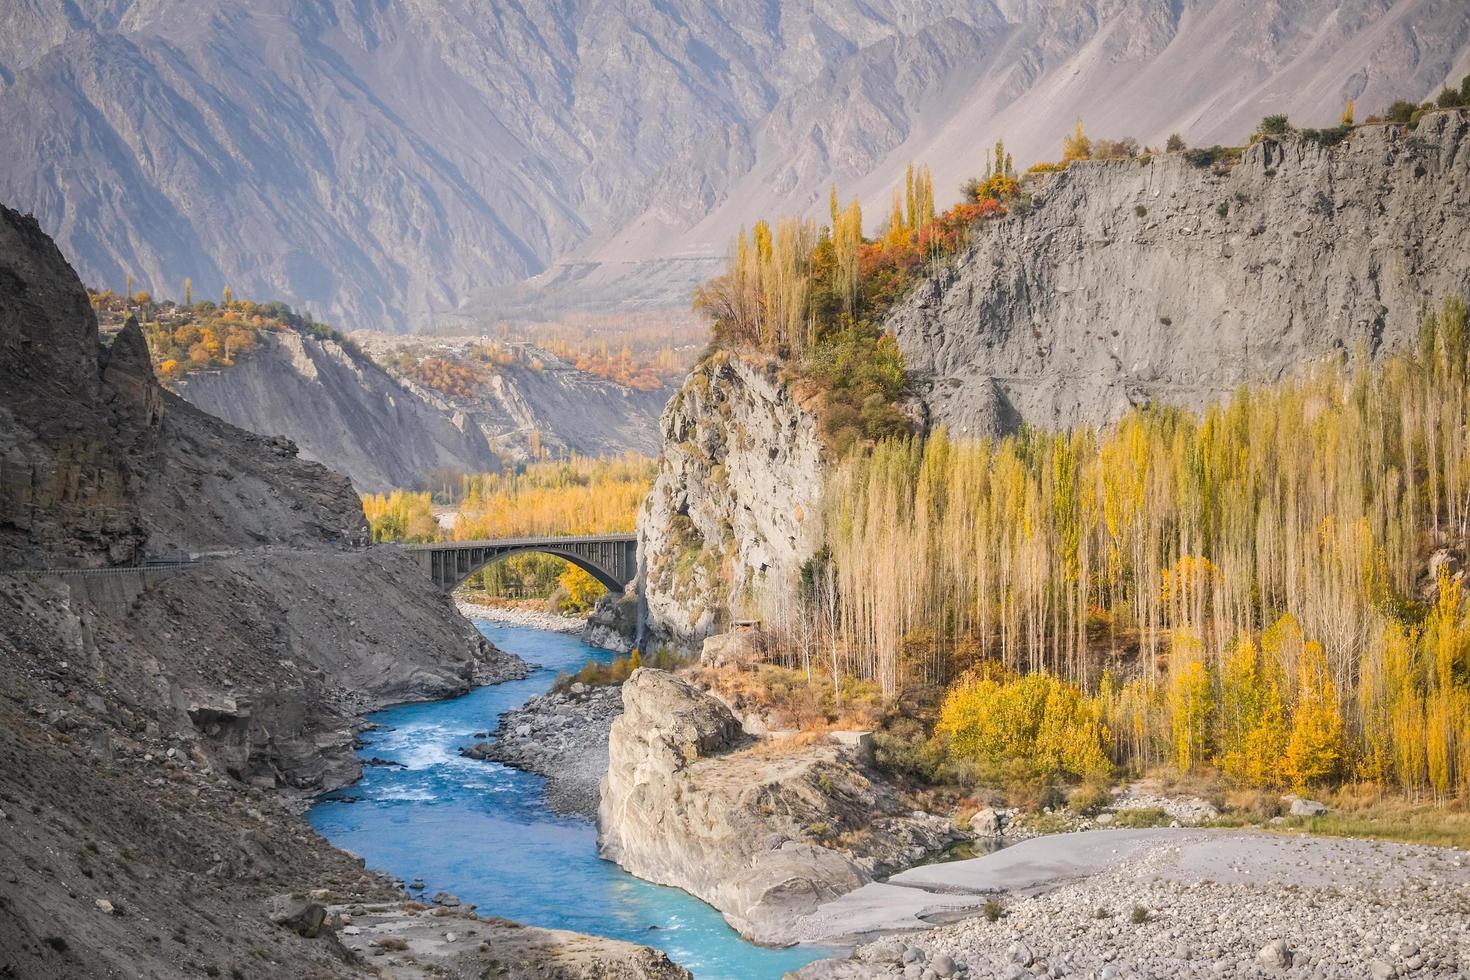 Río Hunza que fluye a través de la cordillera de Karakoram. foto